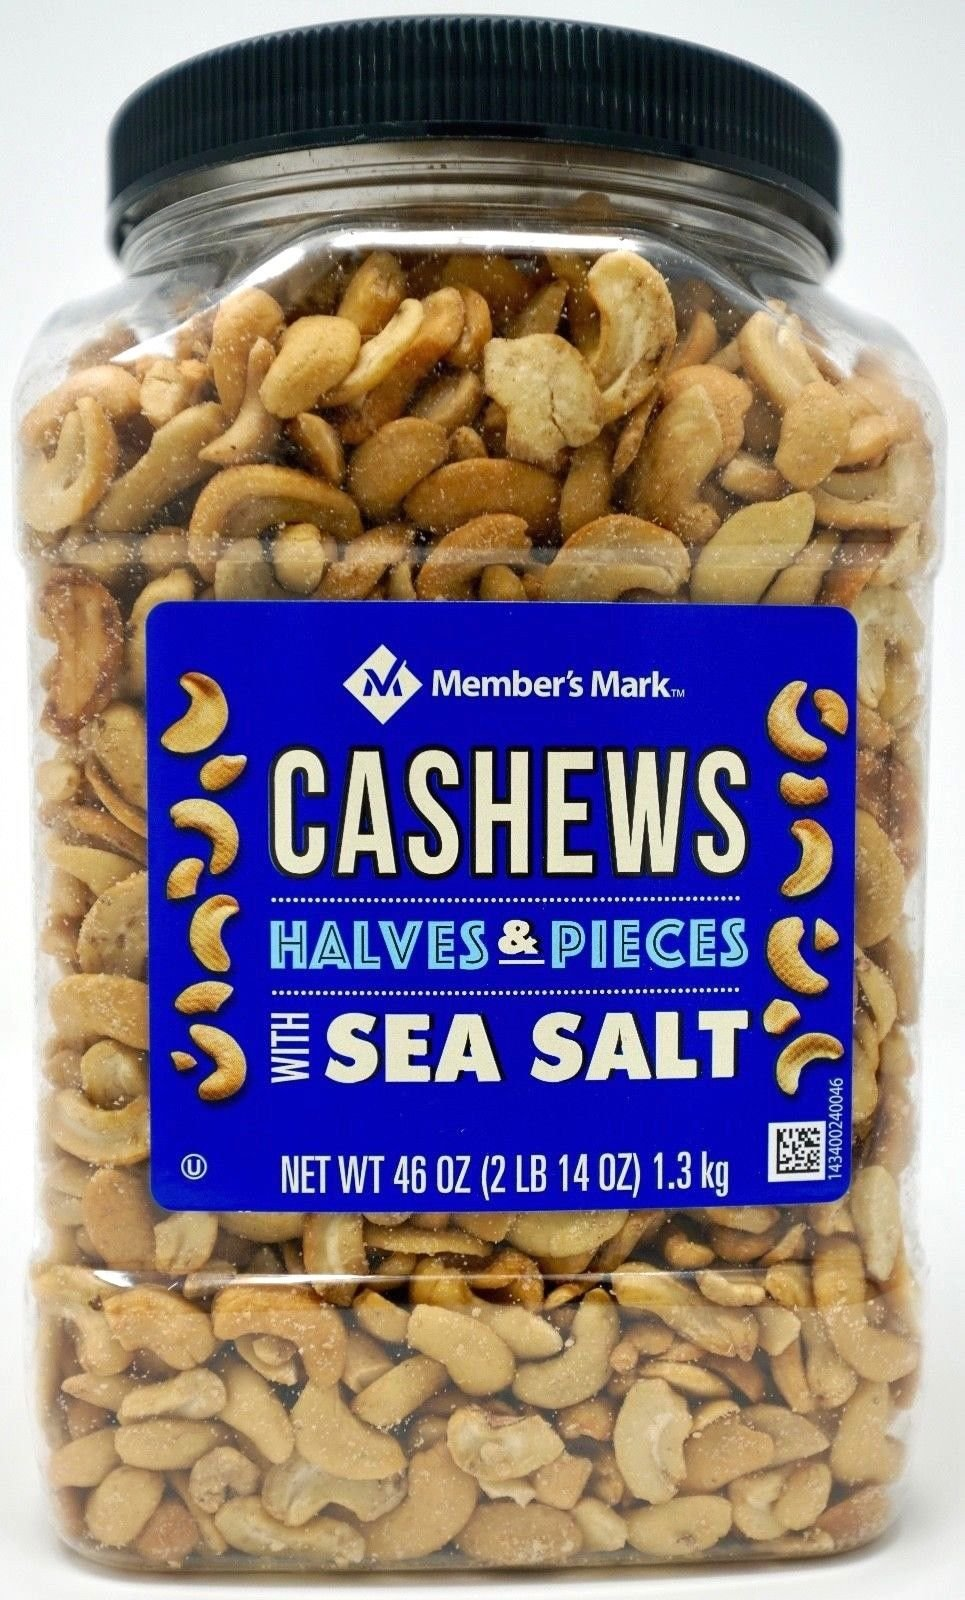 Member's Mark Cashews Halves & Pieces with Sea Salt, 46 OZ